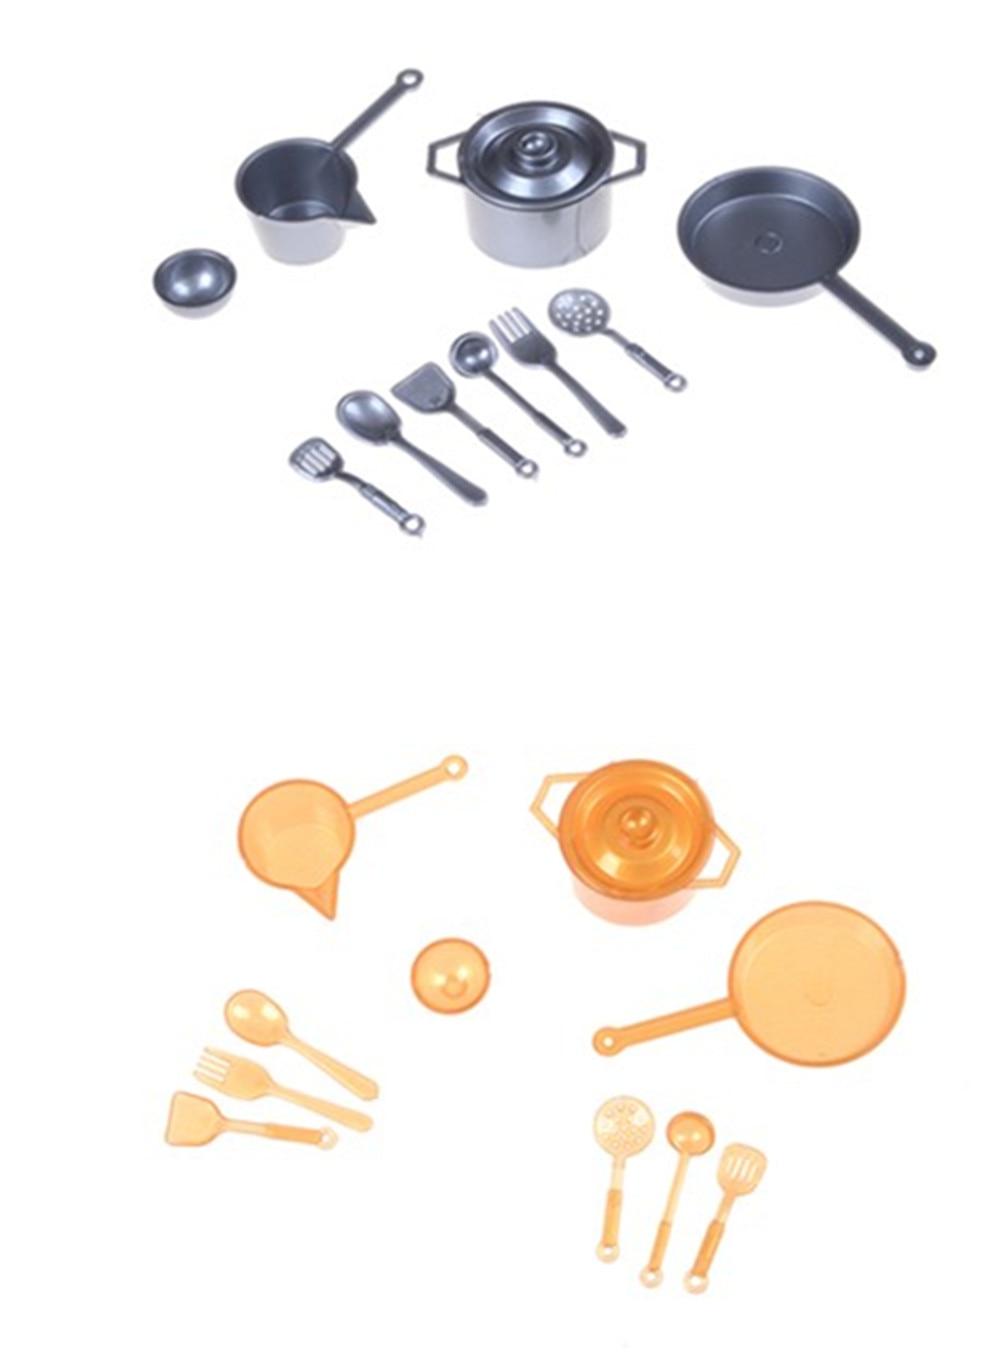 10pcs/set 1:12 Dollhouse Miniature Figure Fork Pot Kitchen Set Food Toys For Children Accessories Dolls Brinquedos Meninon